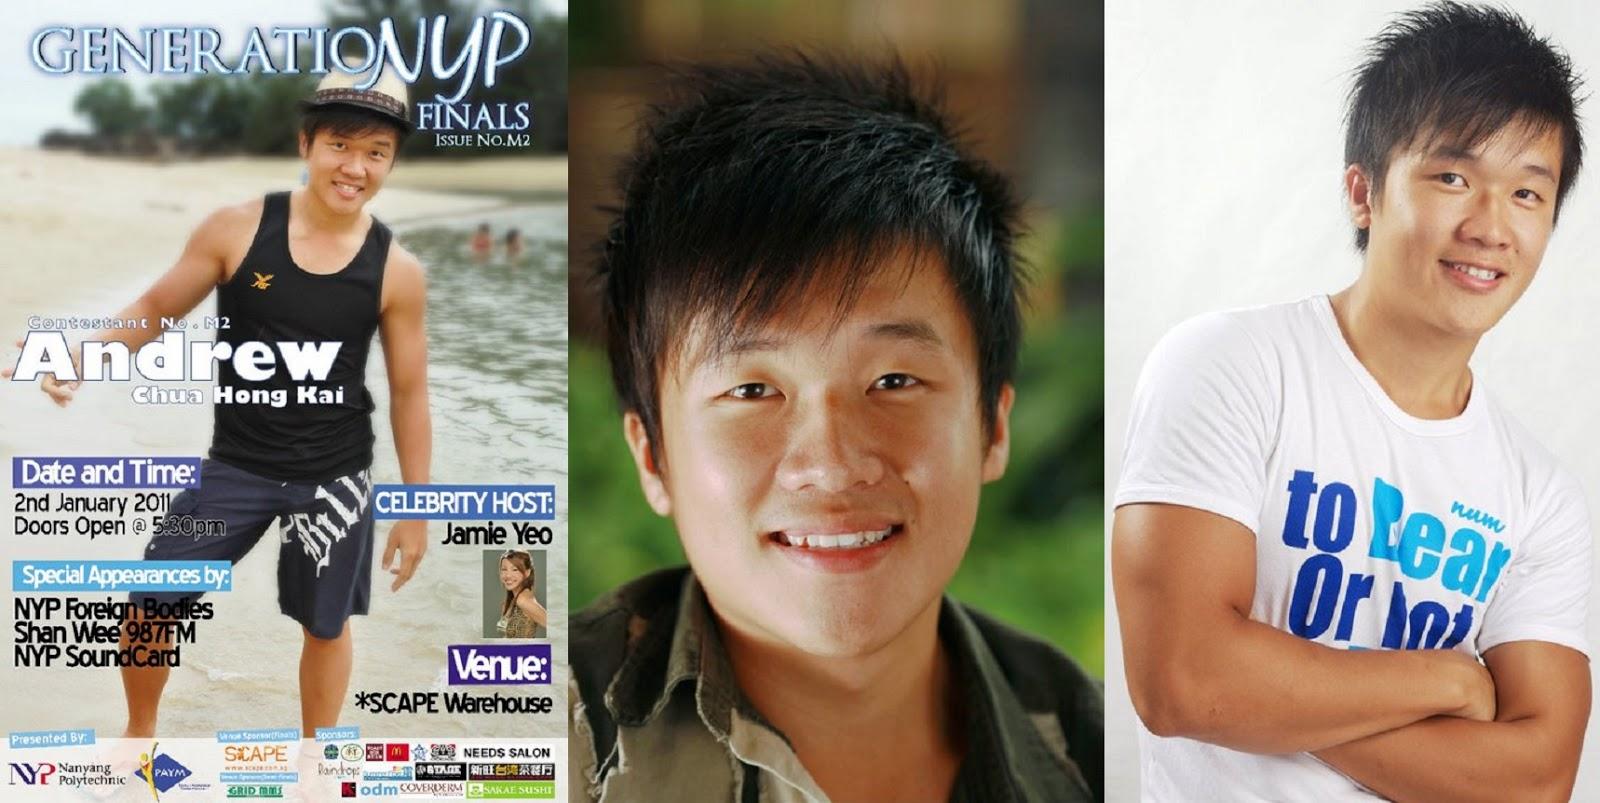 ManSA (Manhunt Singapore Alumni): BACK FOR MORE